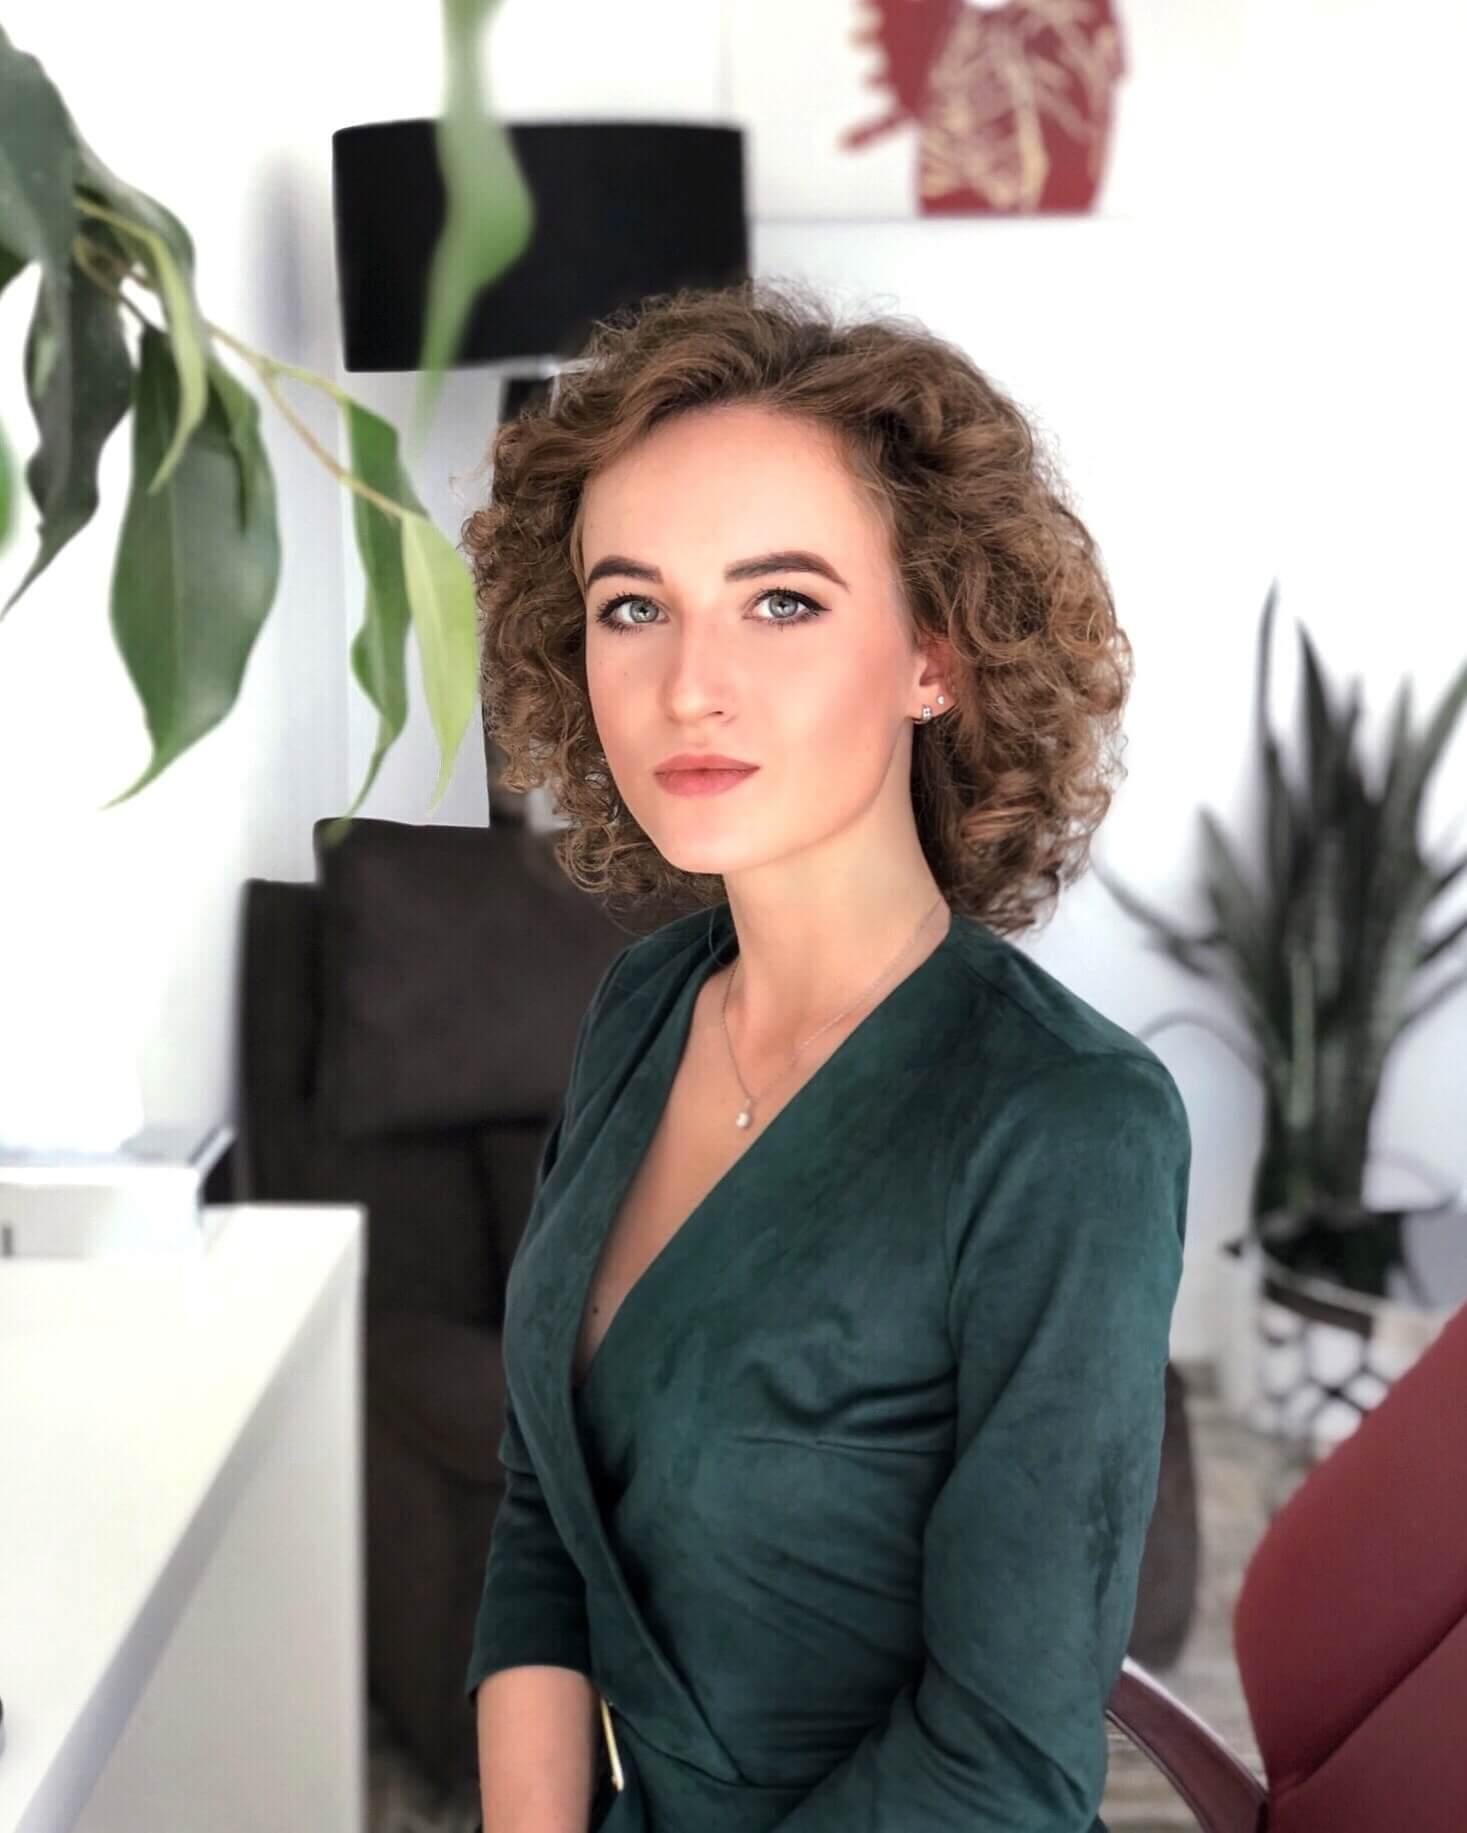 Яна Ярашева